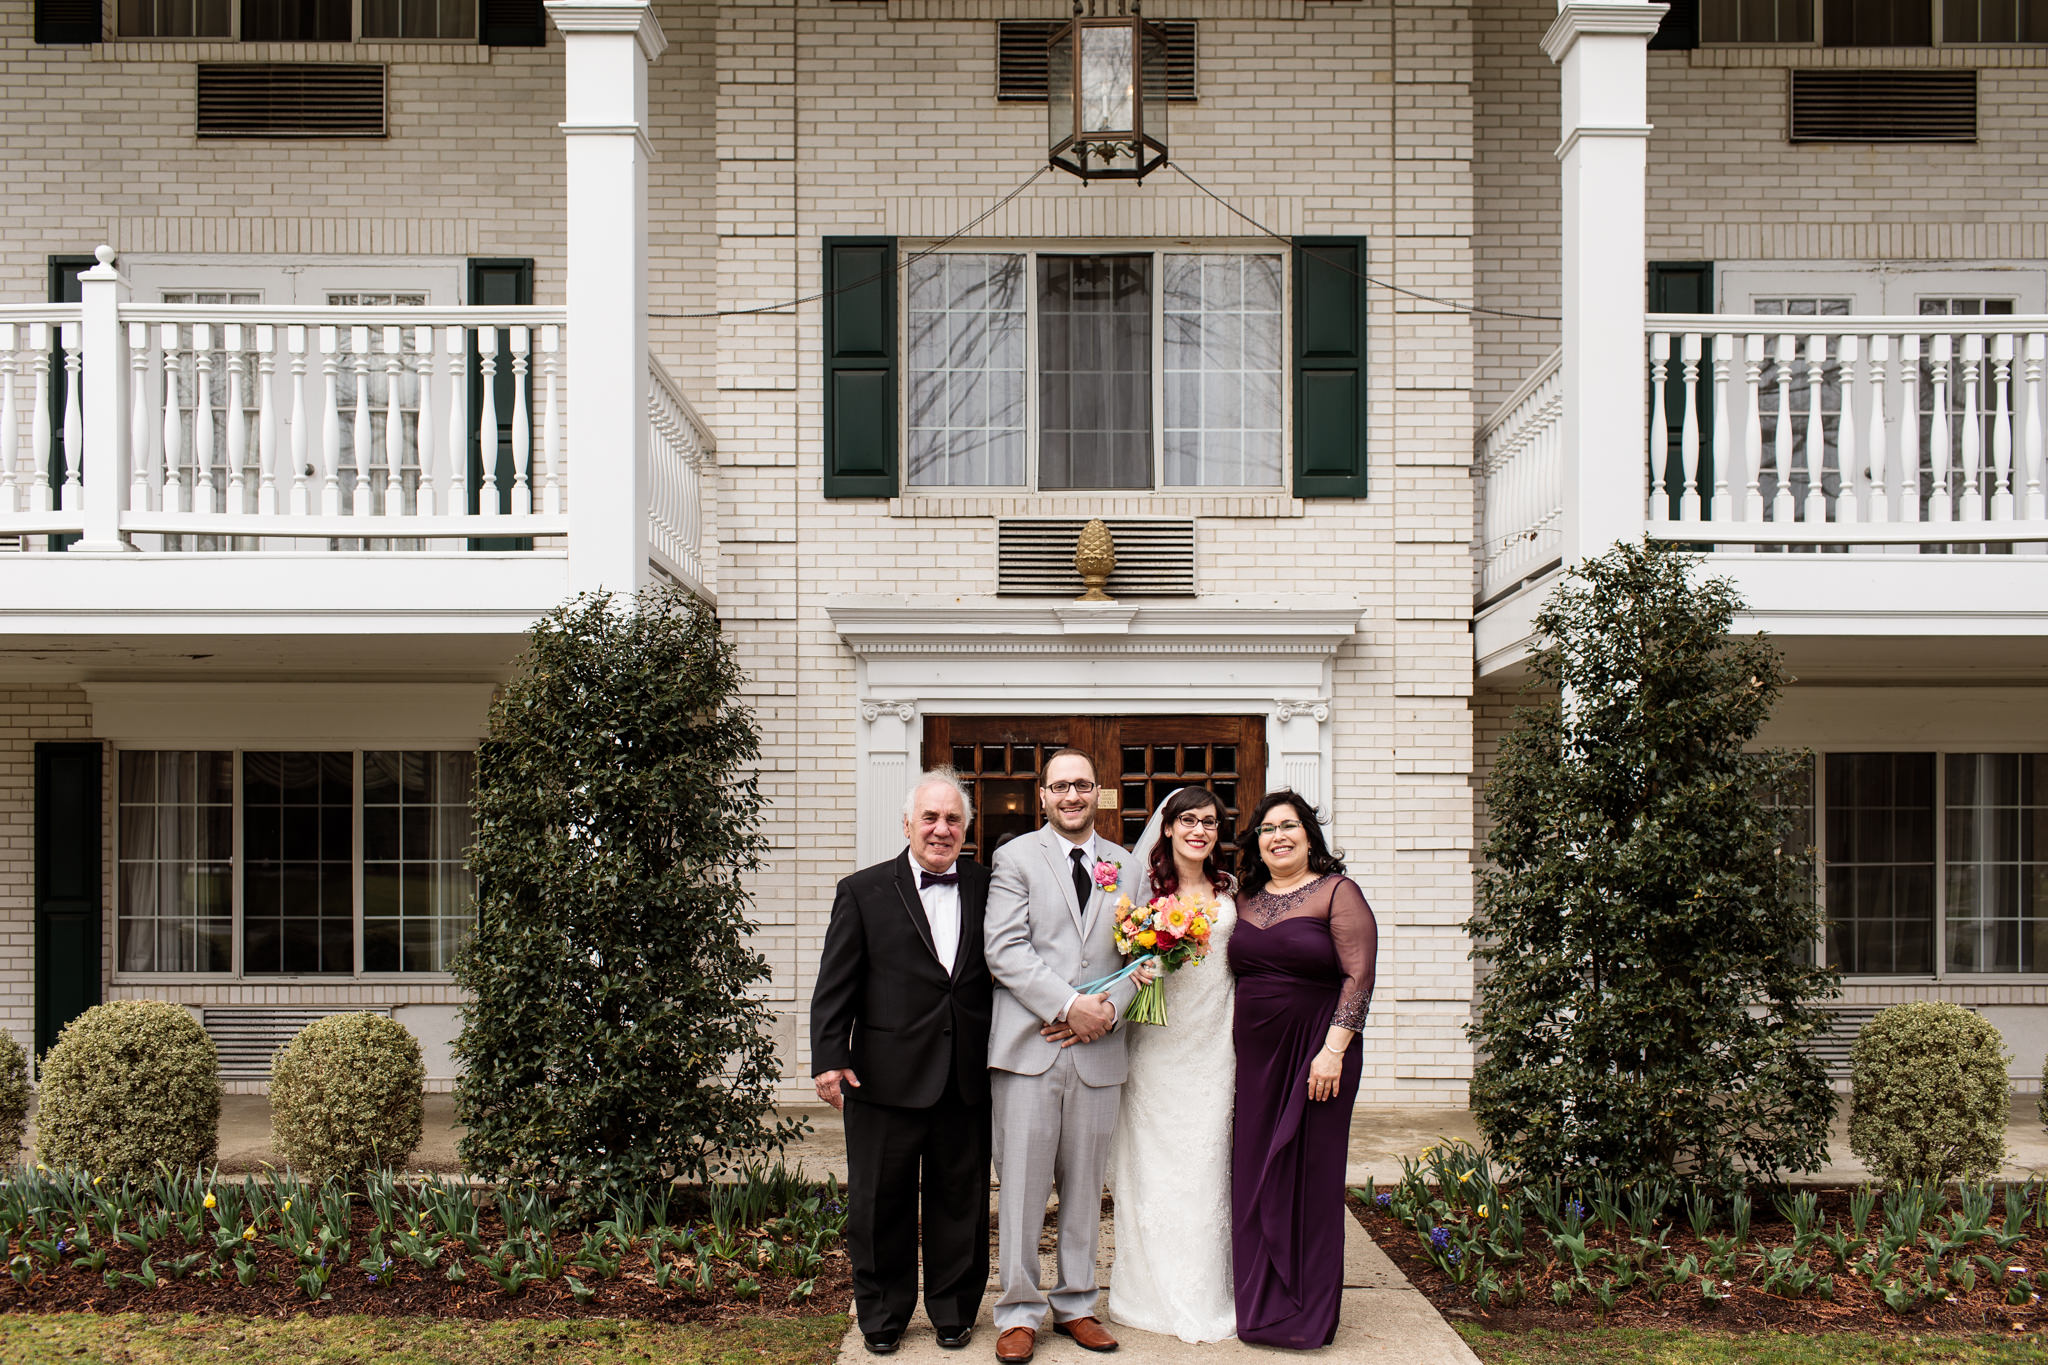 Hanchar_Madison_Hotel_NJ_Wedding_7R5A8406.jpg